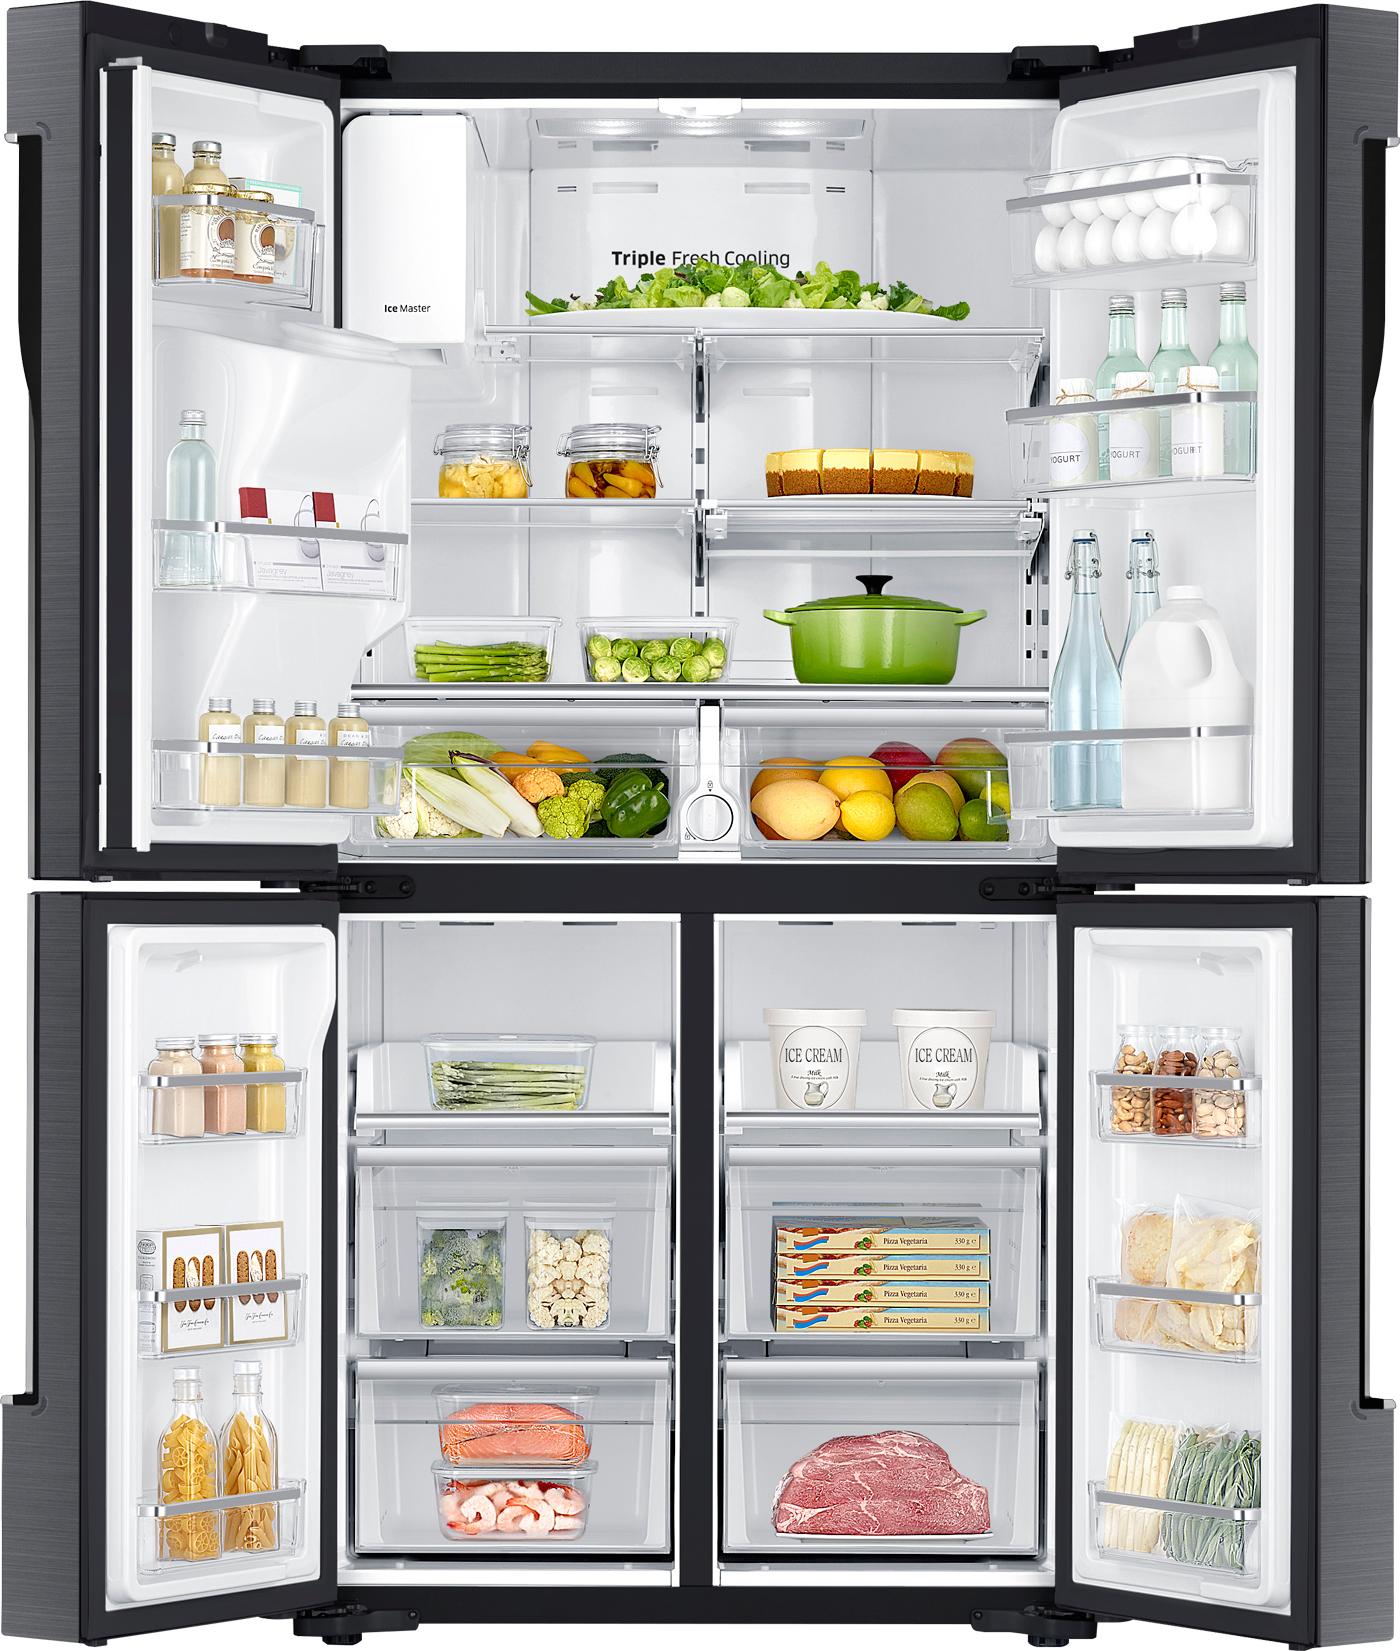 Uncategorized Best Store To Buy Kitchen Appliances samsung open house at best buy stores fridge